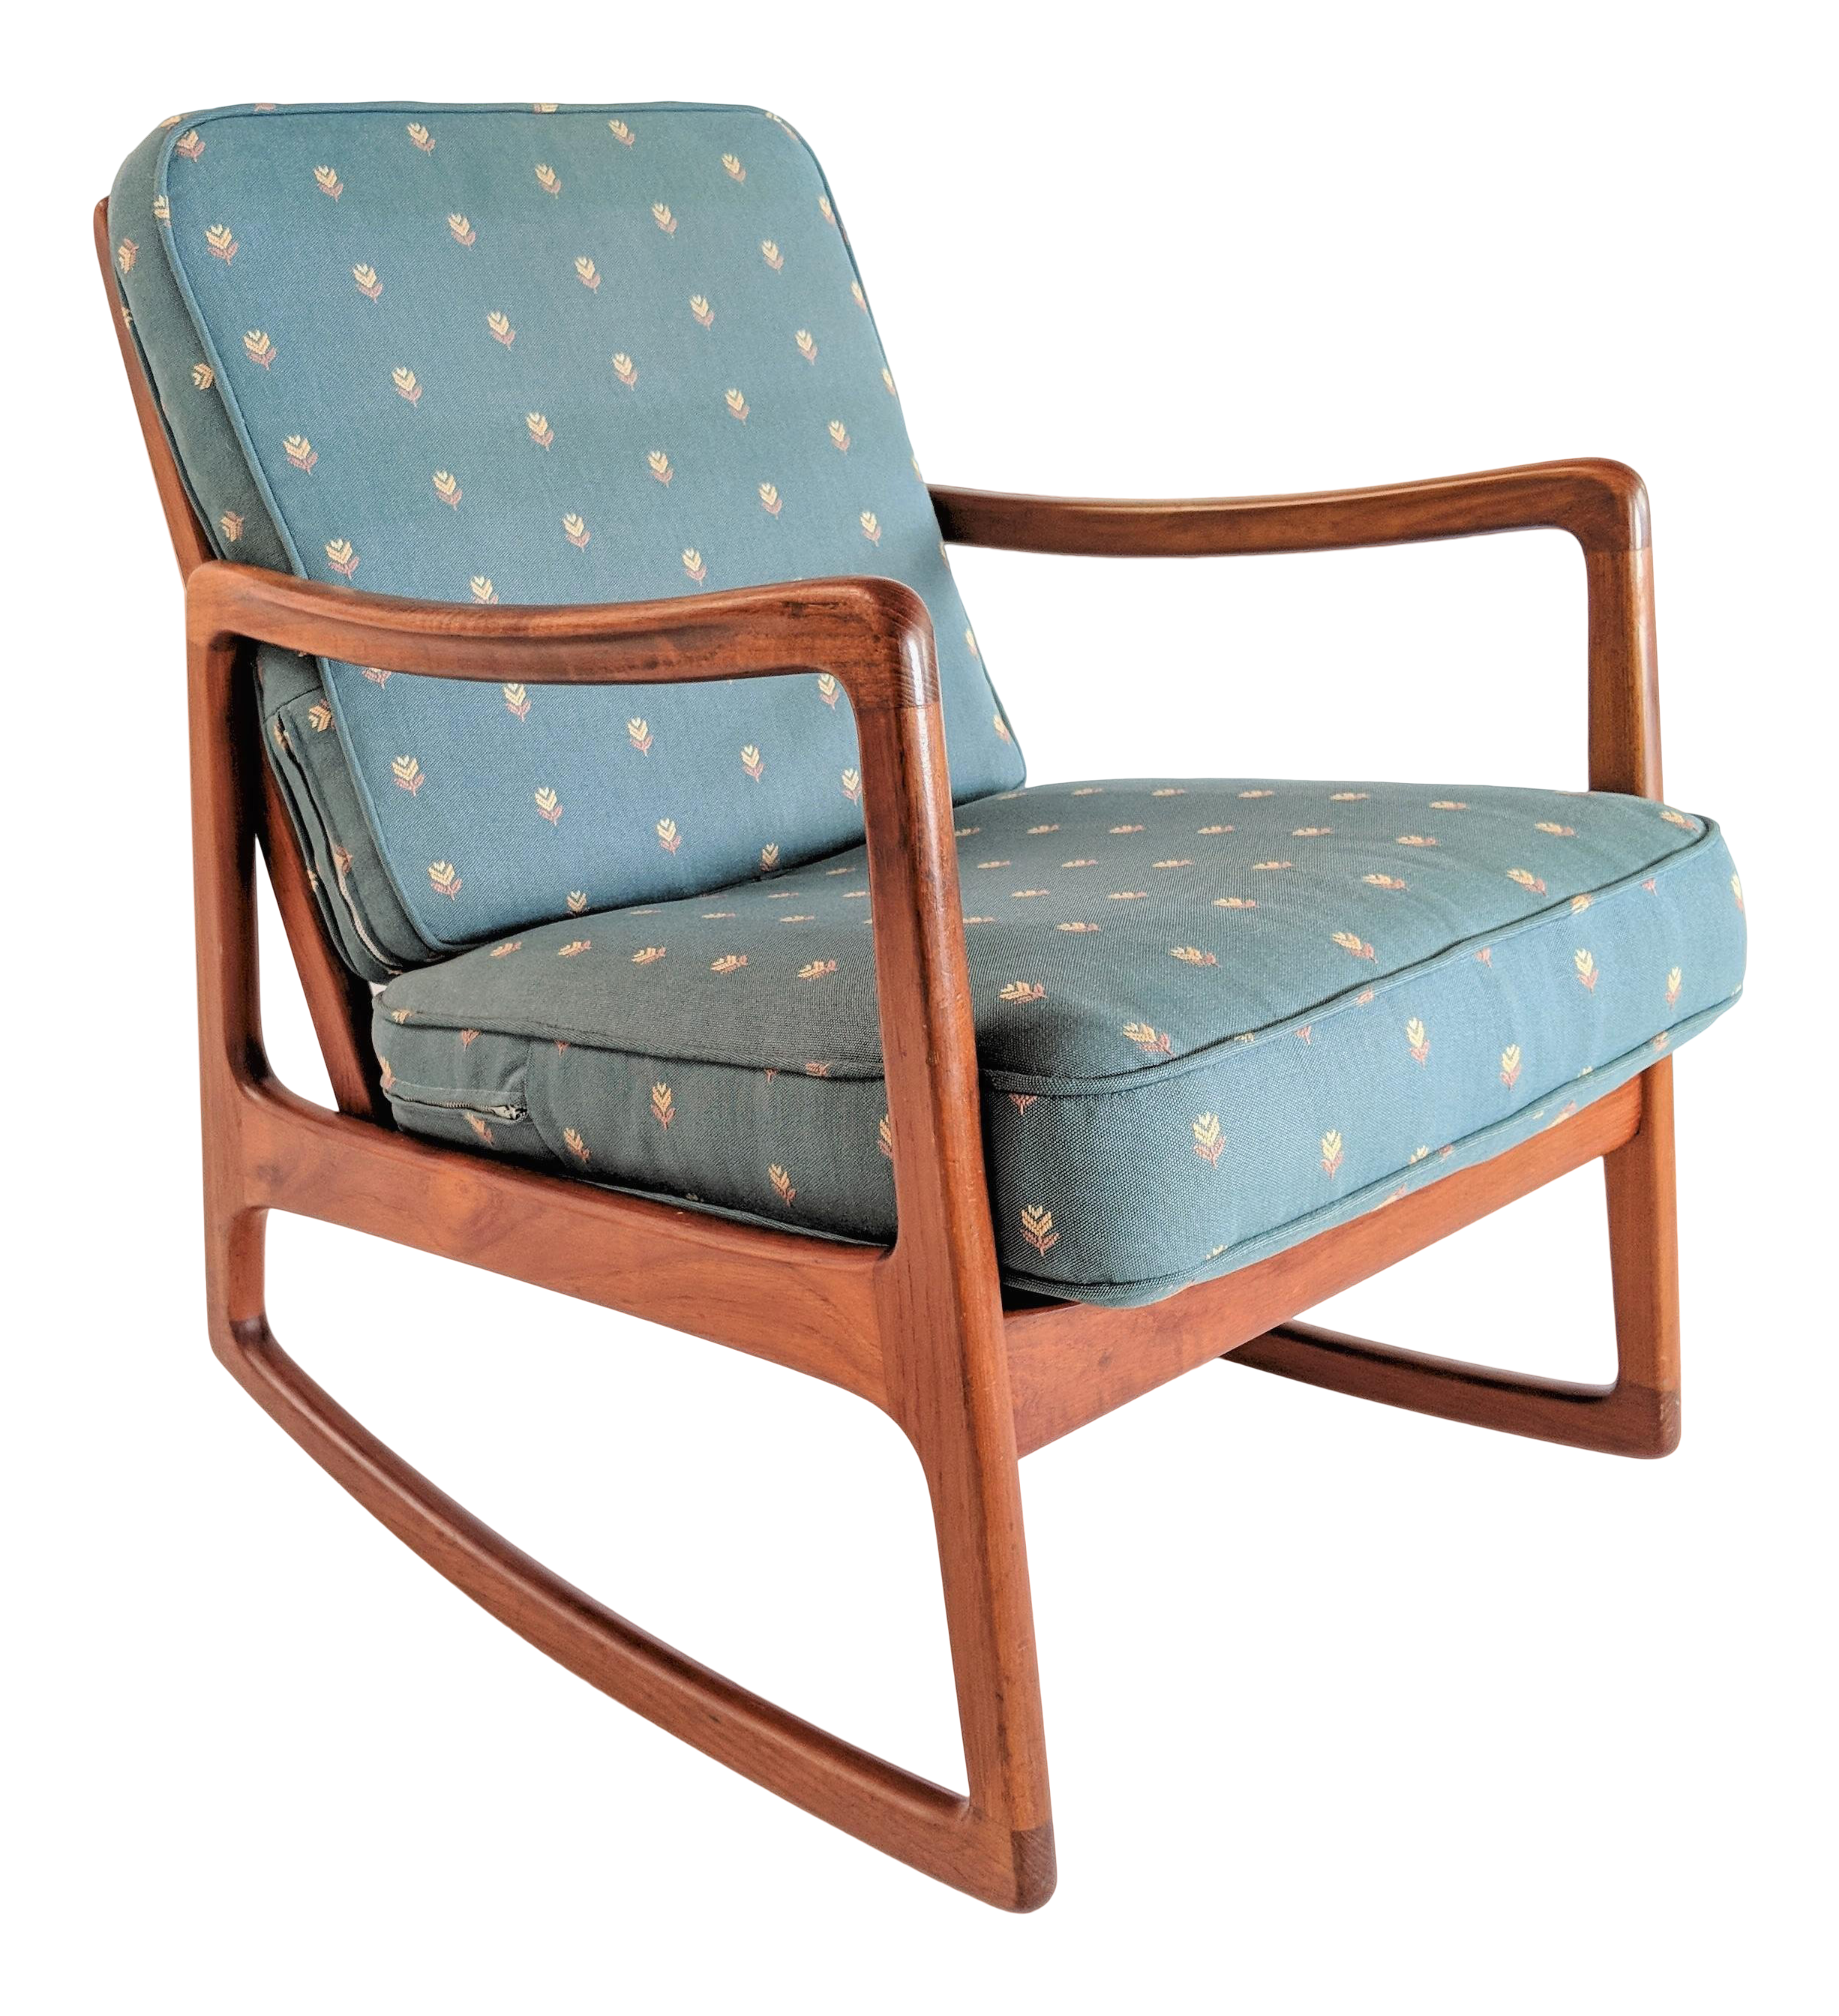 1960s Danish Modern Ole Wanscher For France And Son Teak Rocking Chair Chairish